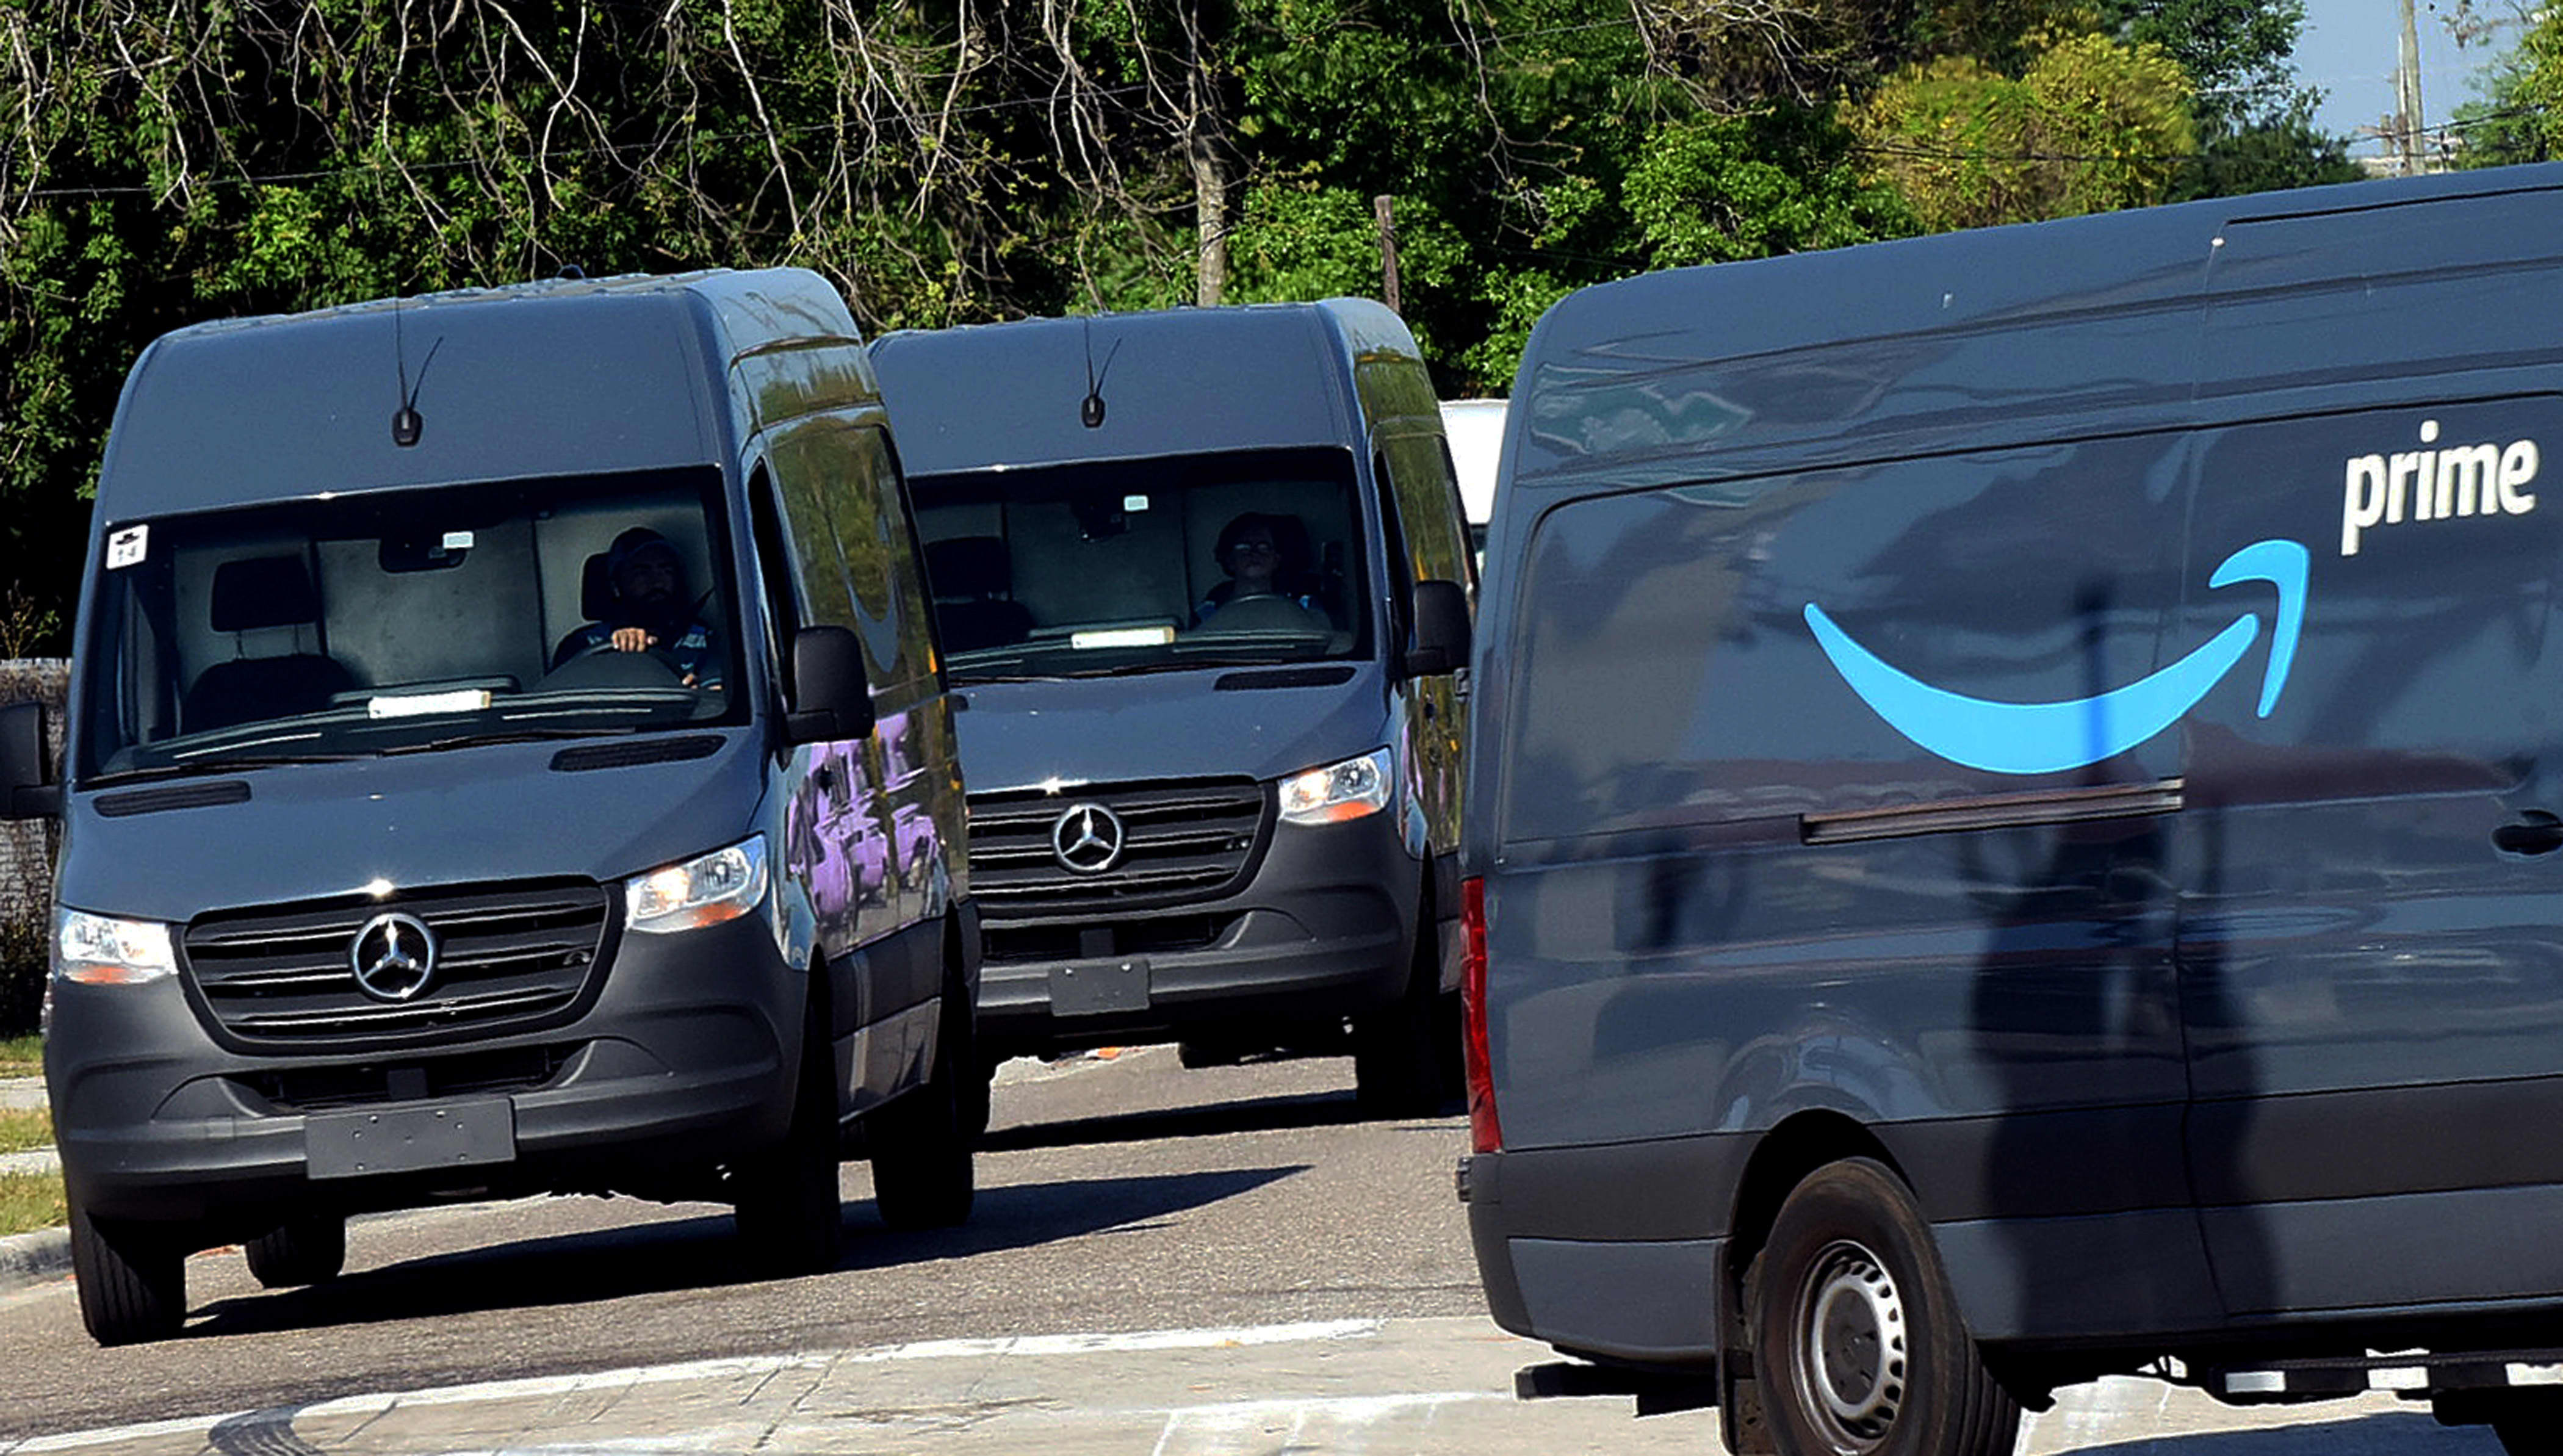 vans prime day